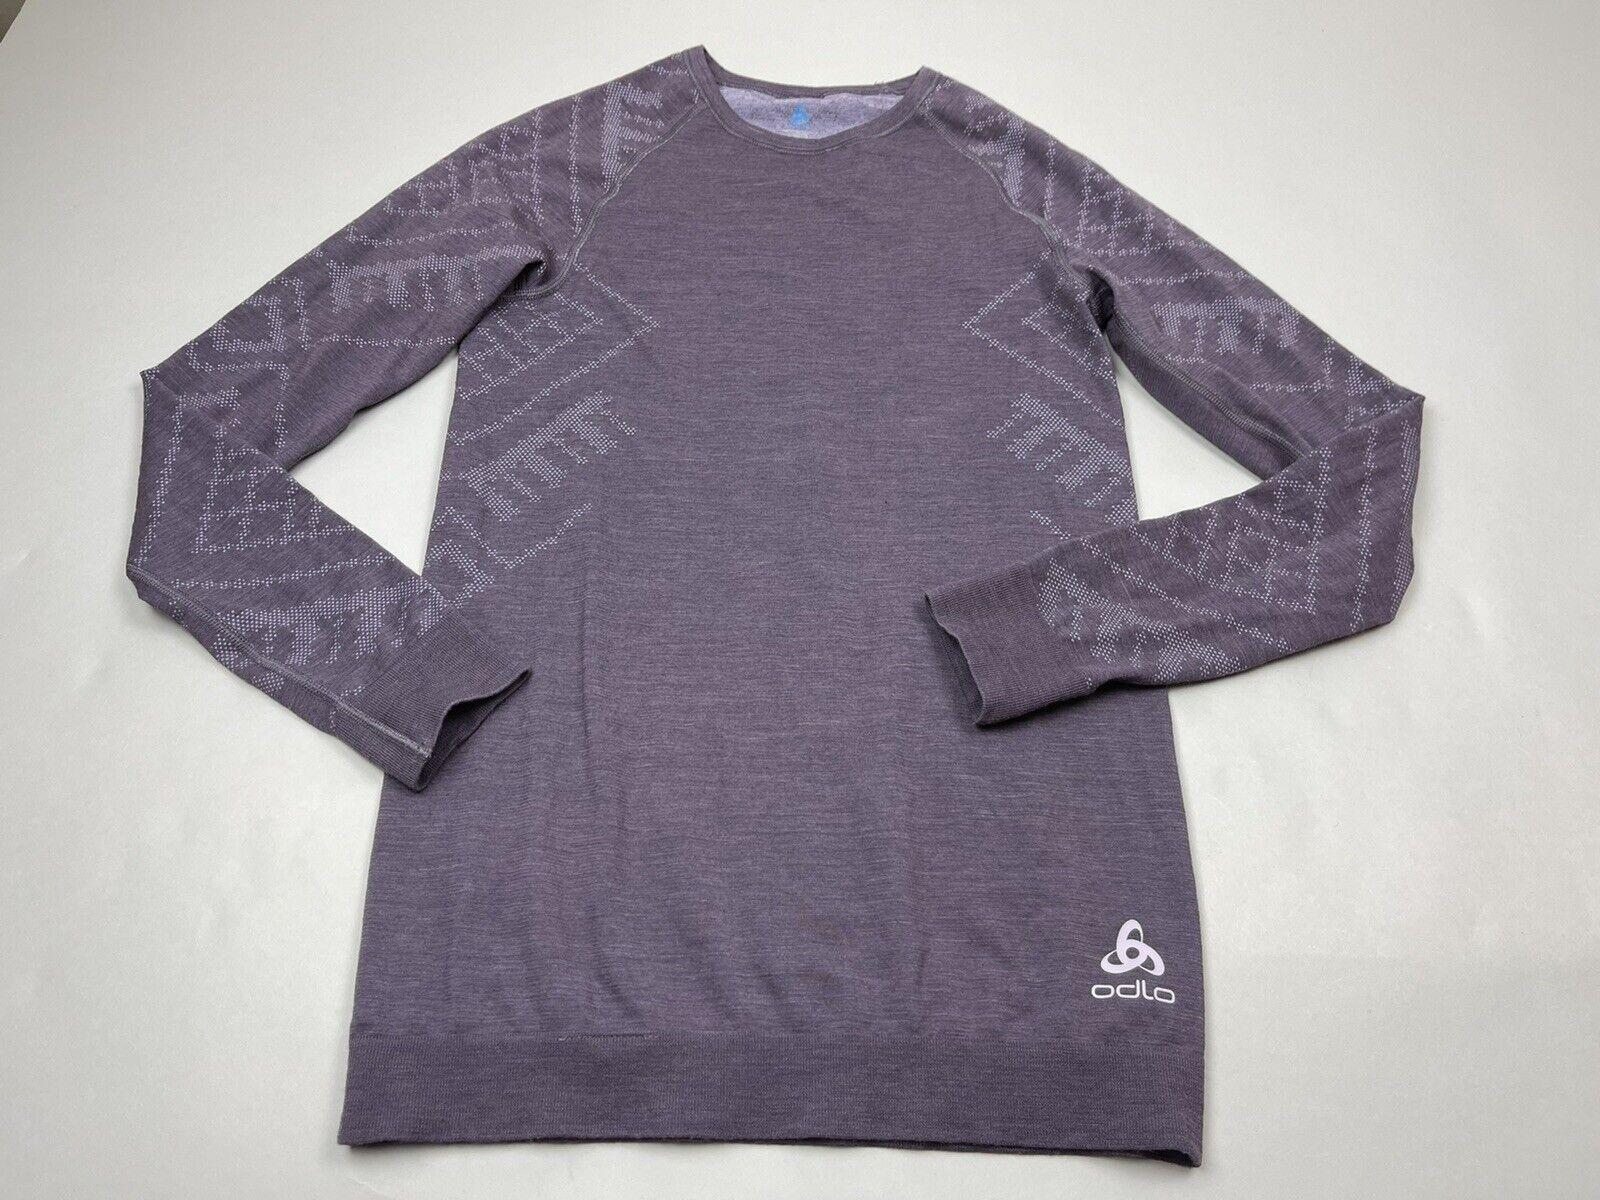 Odlo Merino Blend Warm Base Layer Top Women XS Long Sleeve Shirt